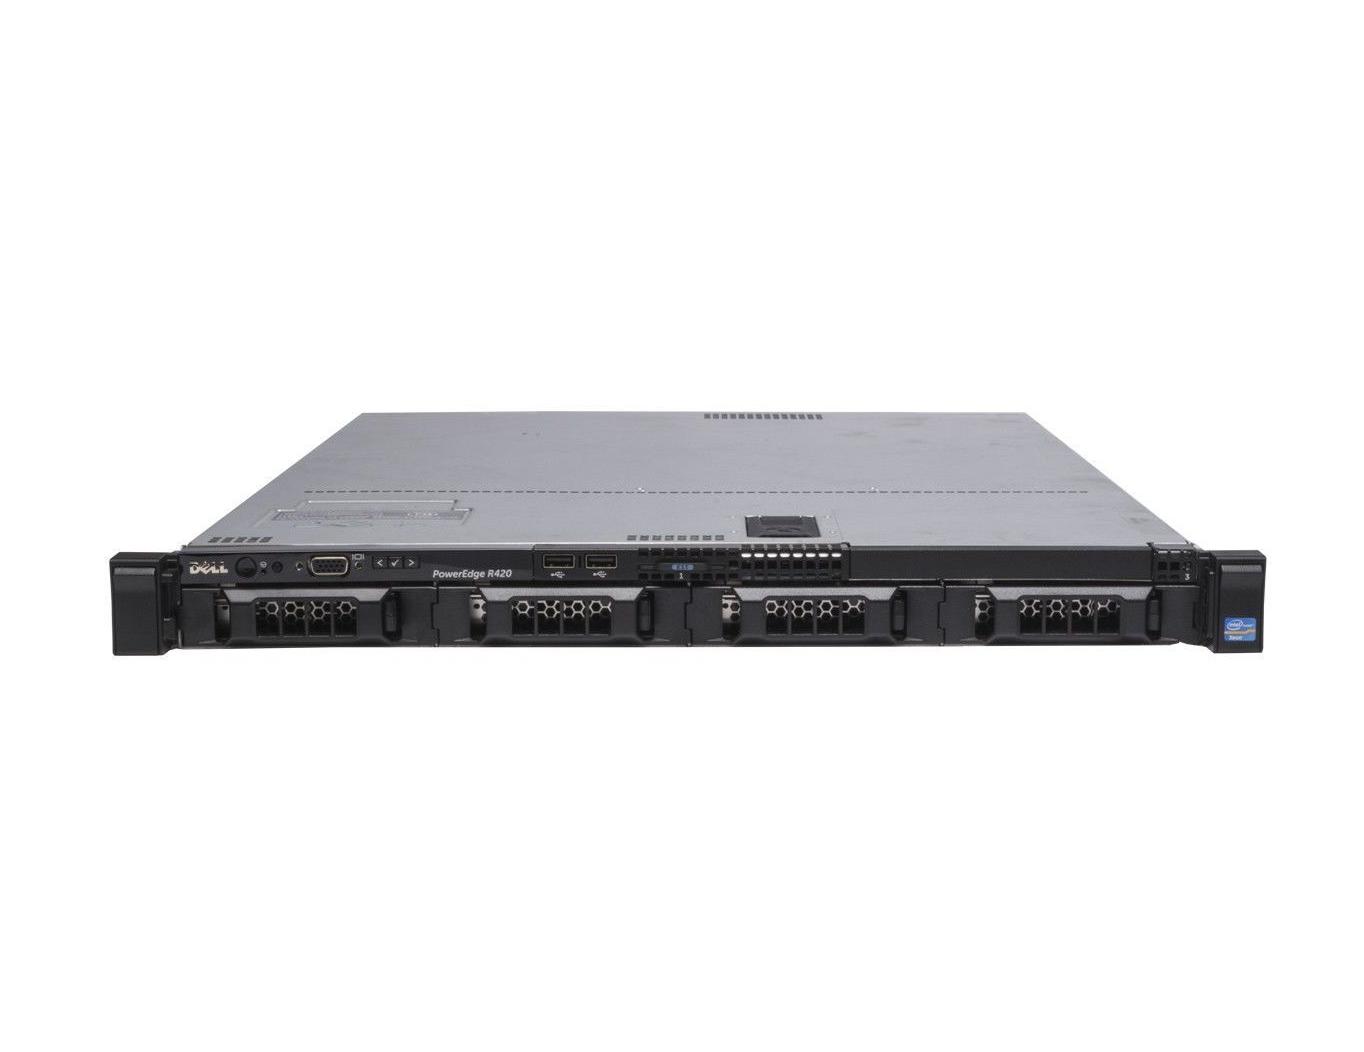 Dell PowerEdge R420 Server